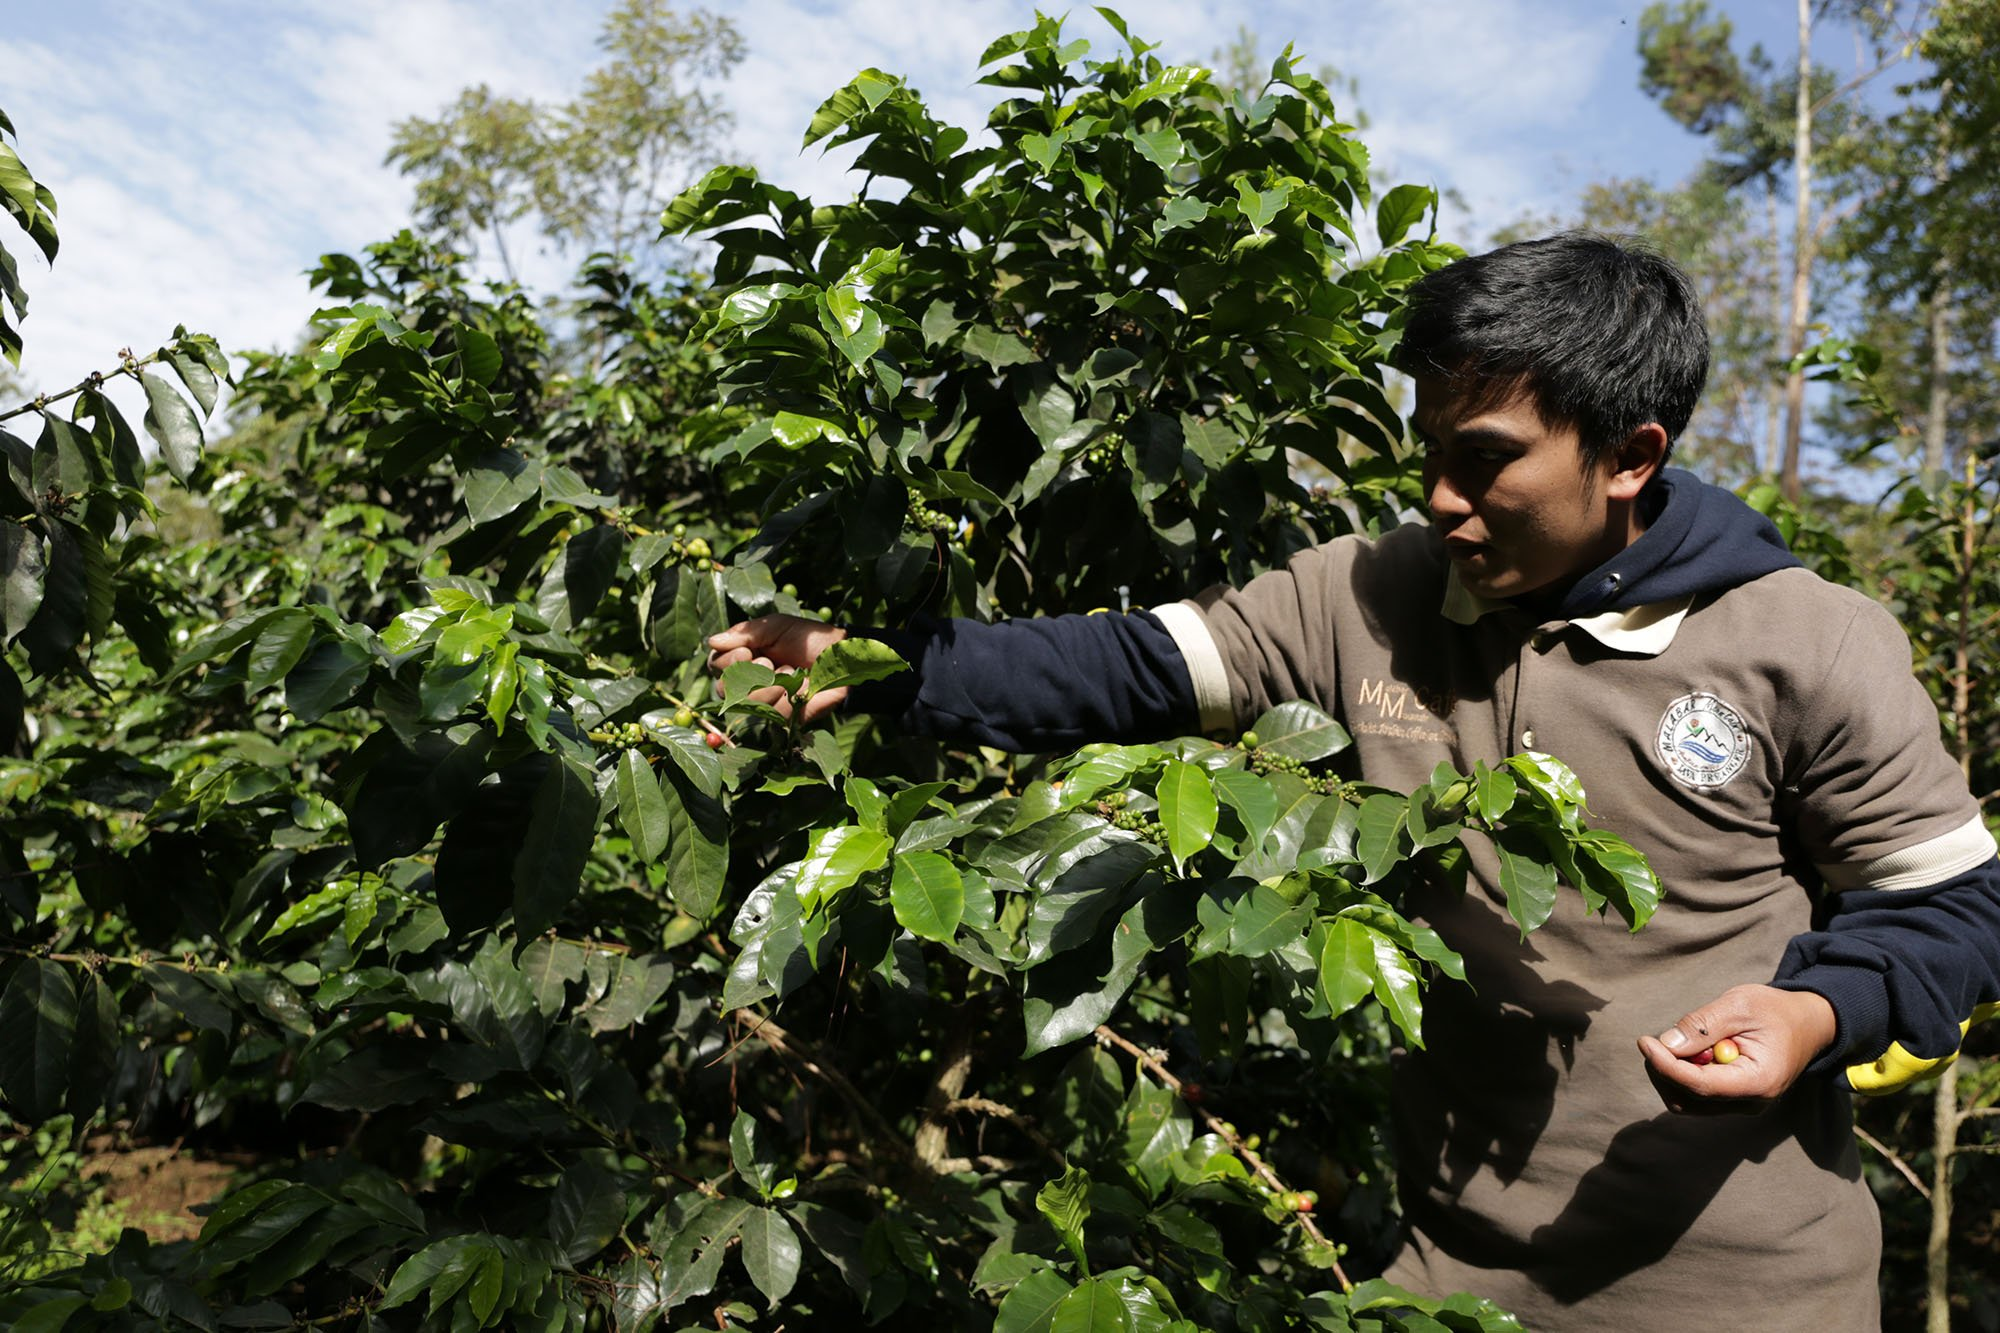 Petani Malabar Mountain Coffee memetik biji kopi yang benar-benar matang di Bandung, Jawa Barat (15/11/2019). Hanya biji kopi yang matang menghasilkan kopi terbaik.